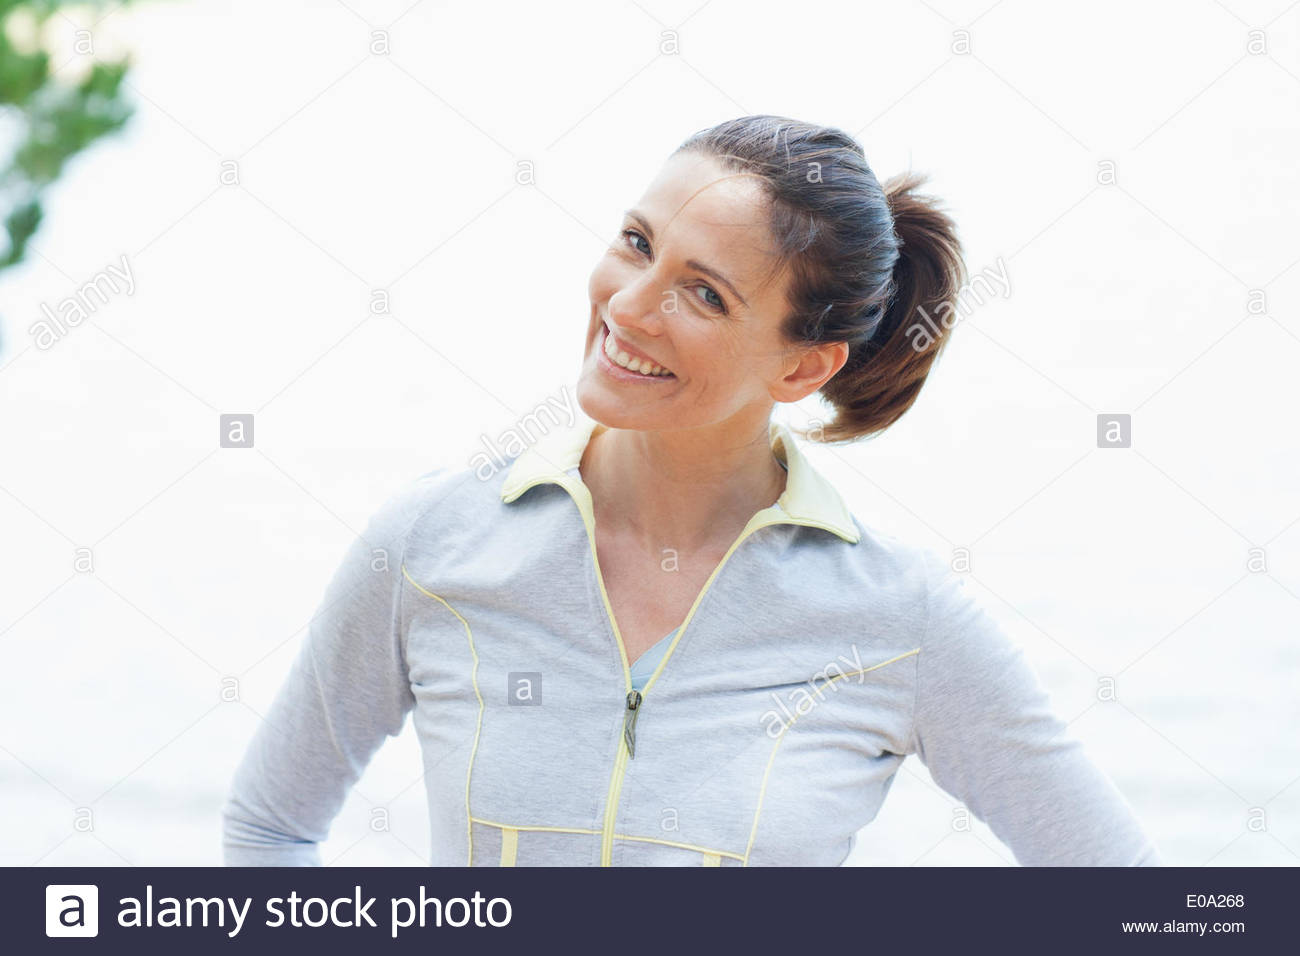 Mujer sonriente en ropa deportiva Imagen De Stock